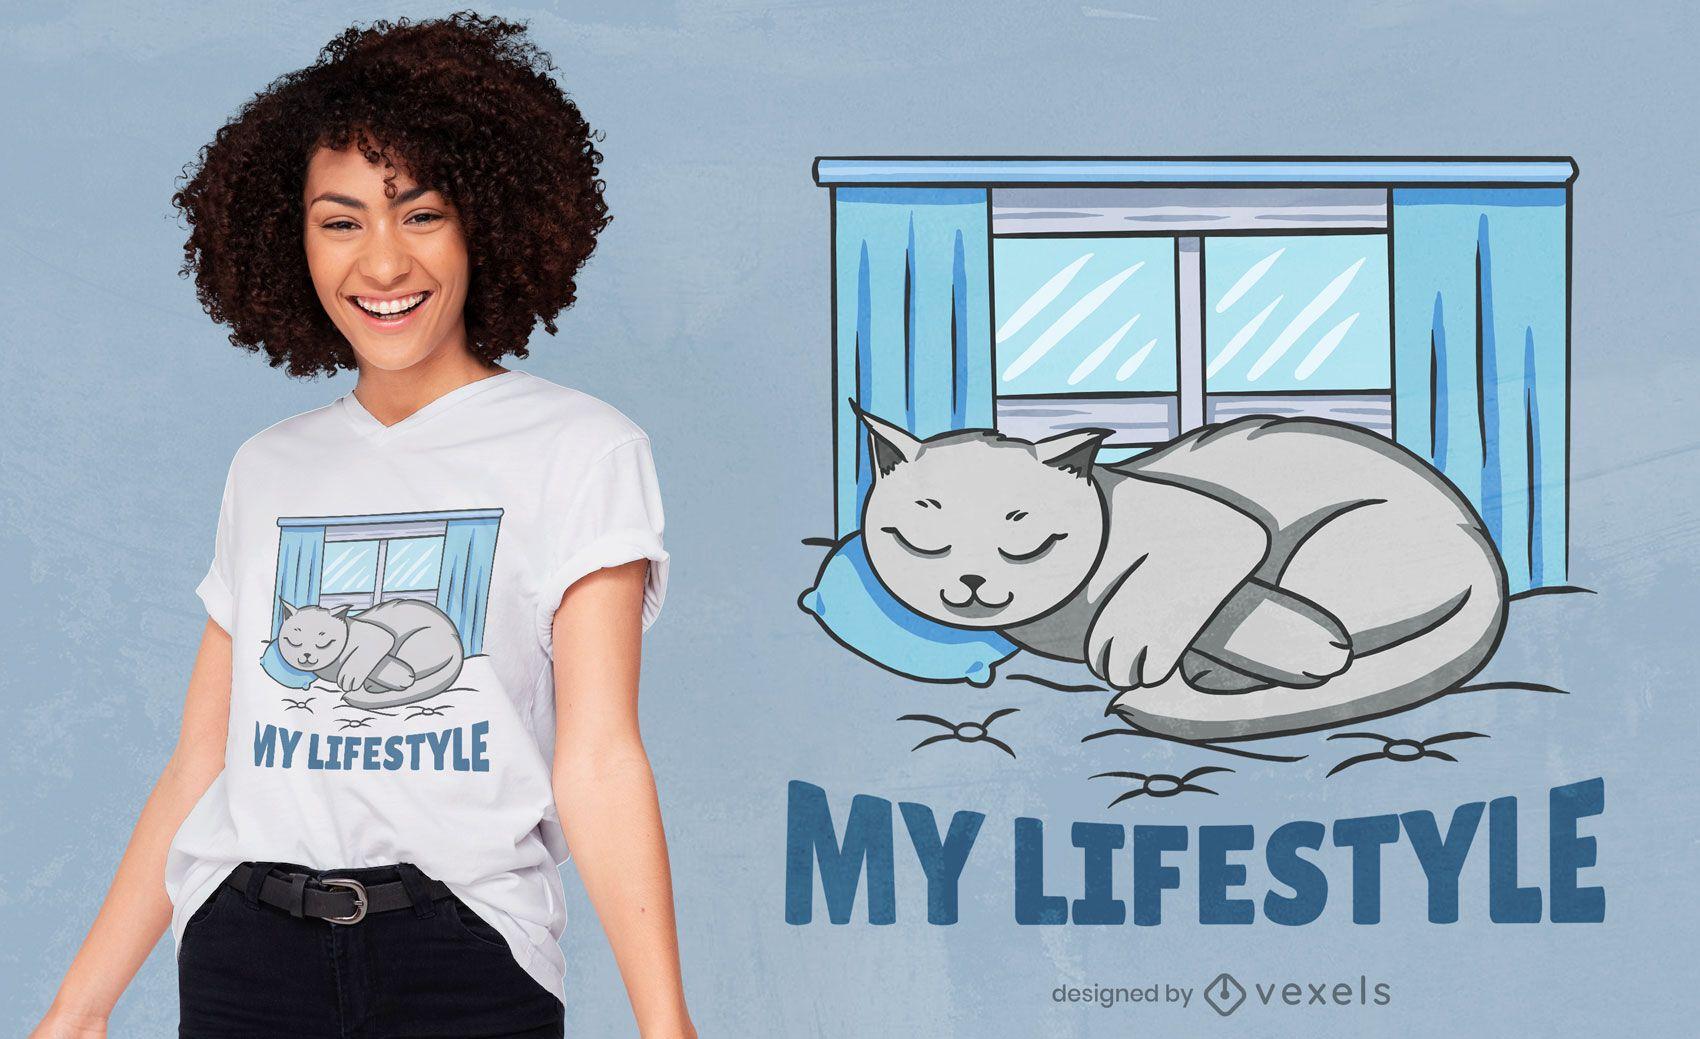 Lifestyle cat t-shirt design